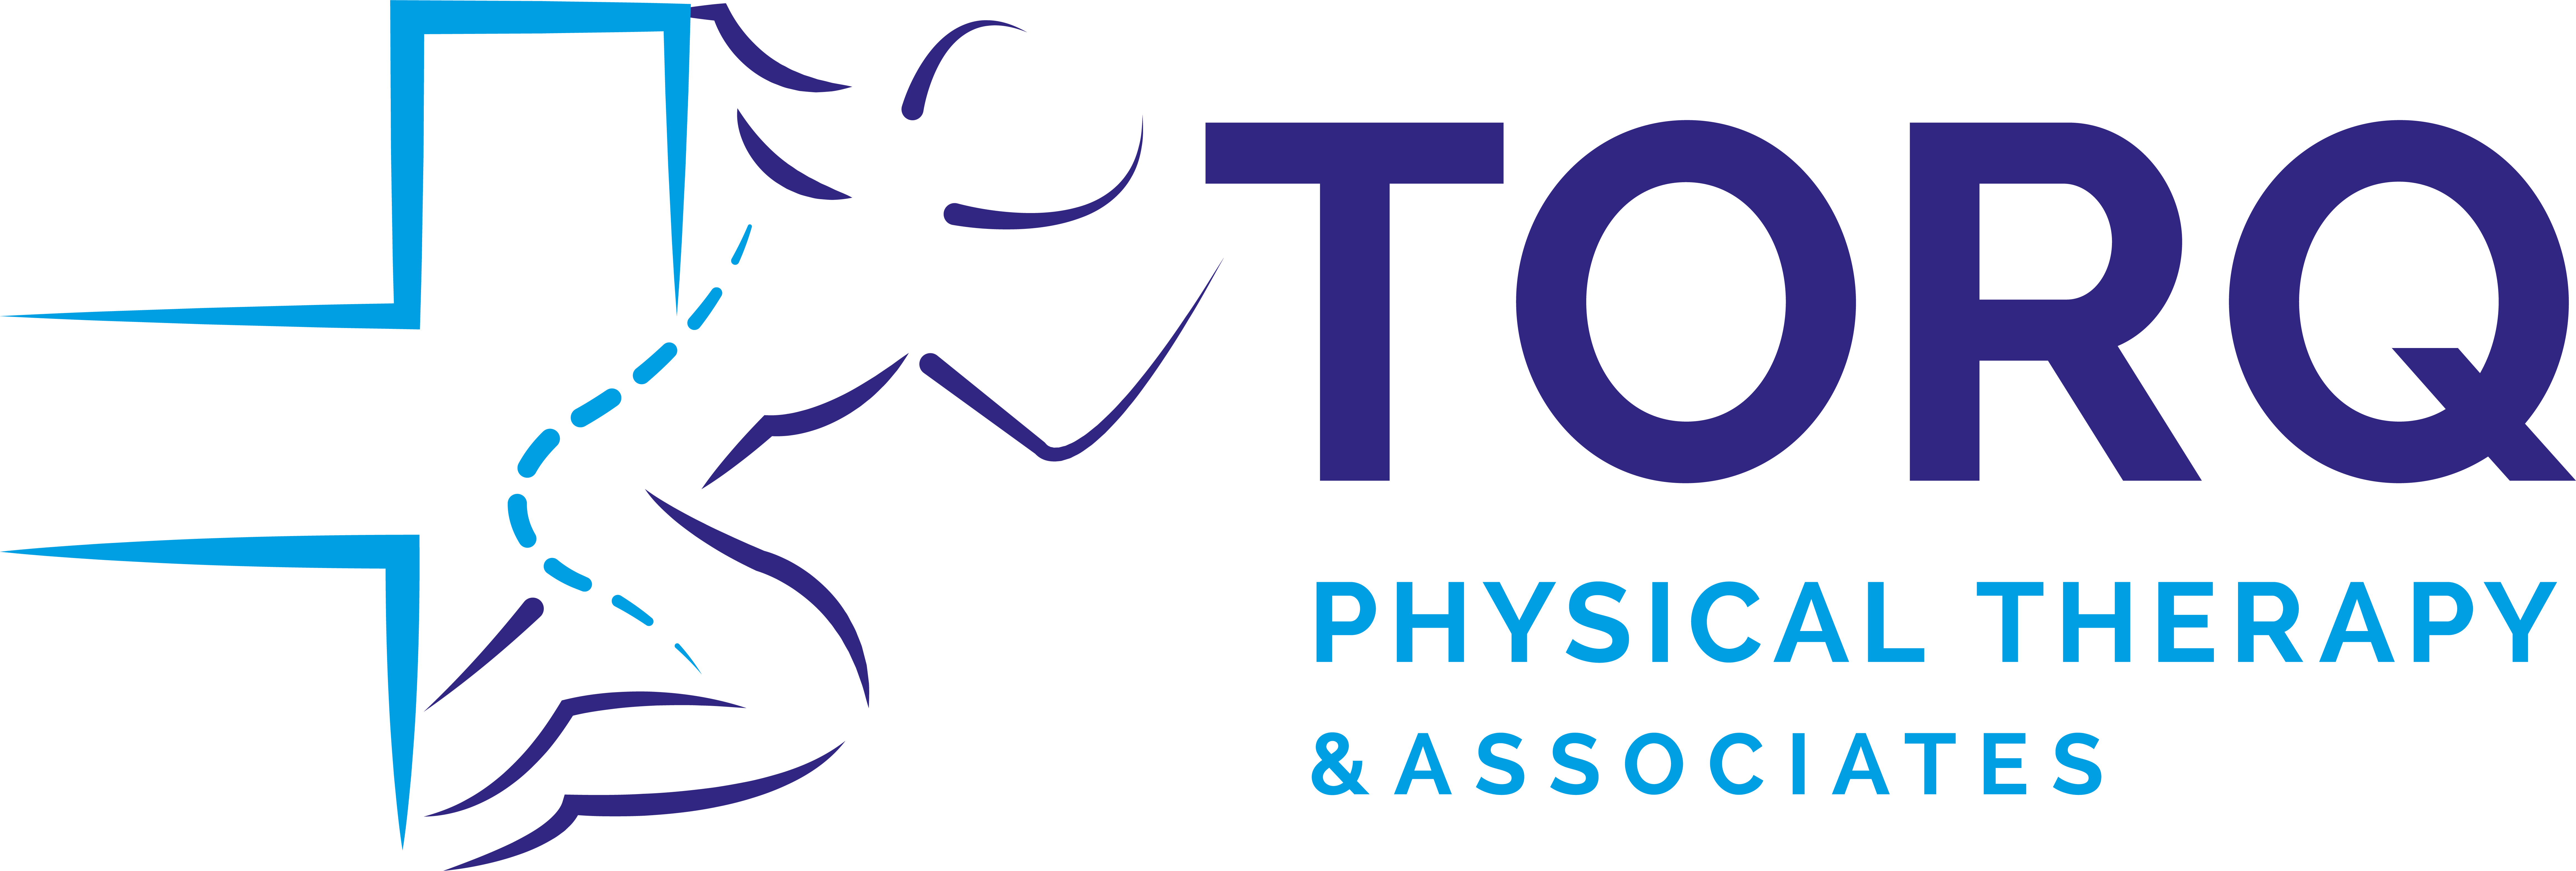 TORQ Physical Therapy & Associates Logo